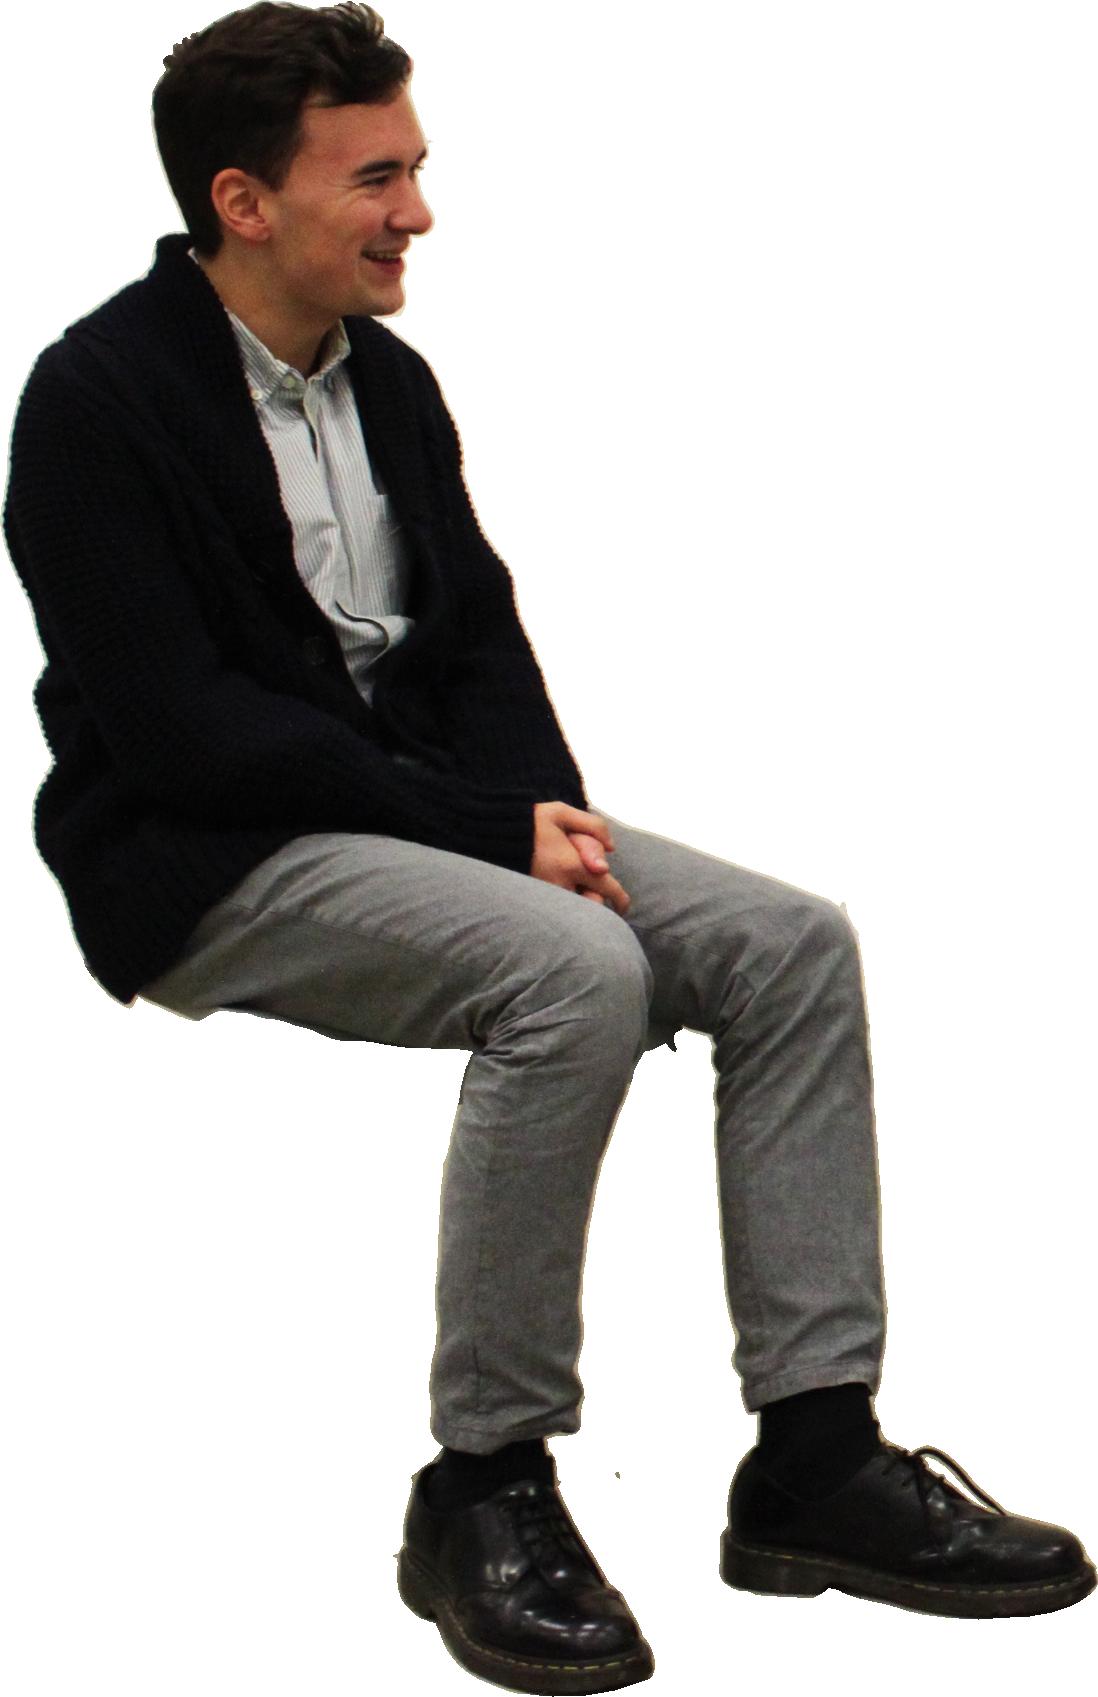 Sitting man PNG images free download